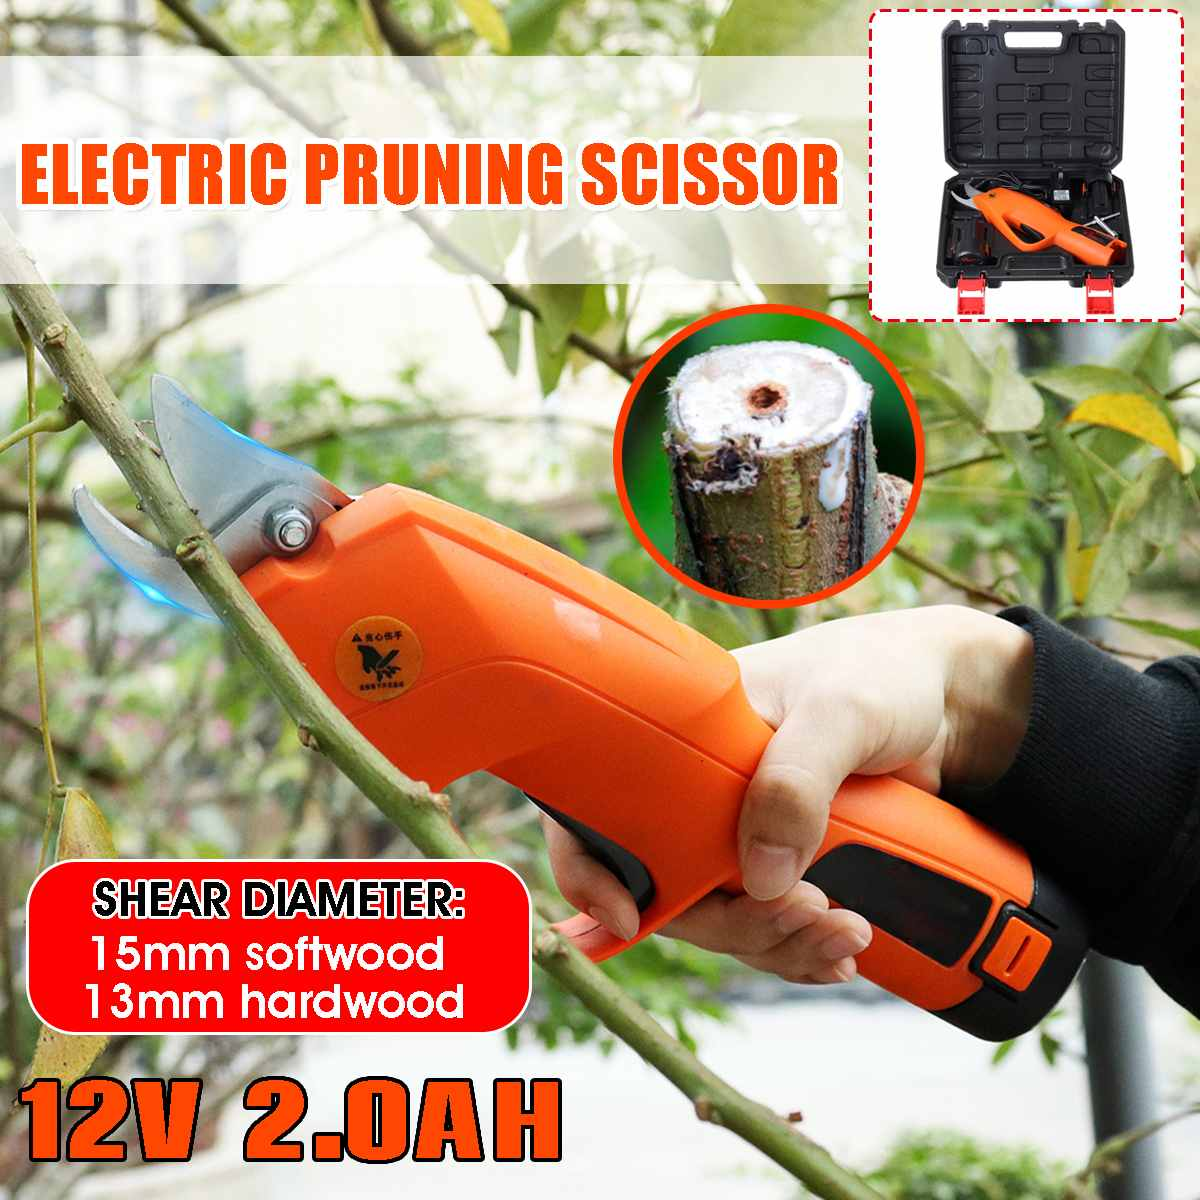 12V 2.0AH Wireless Electric Rechargeable Scissors Pruning Scissor Branch Cutter 30mm Shears Tree Garden Tool With Li-ion Battery